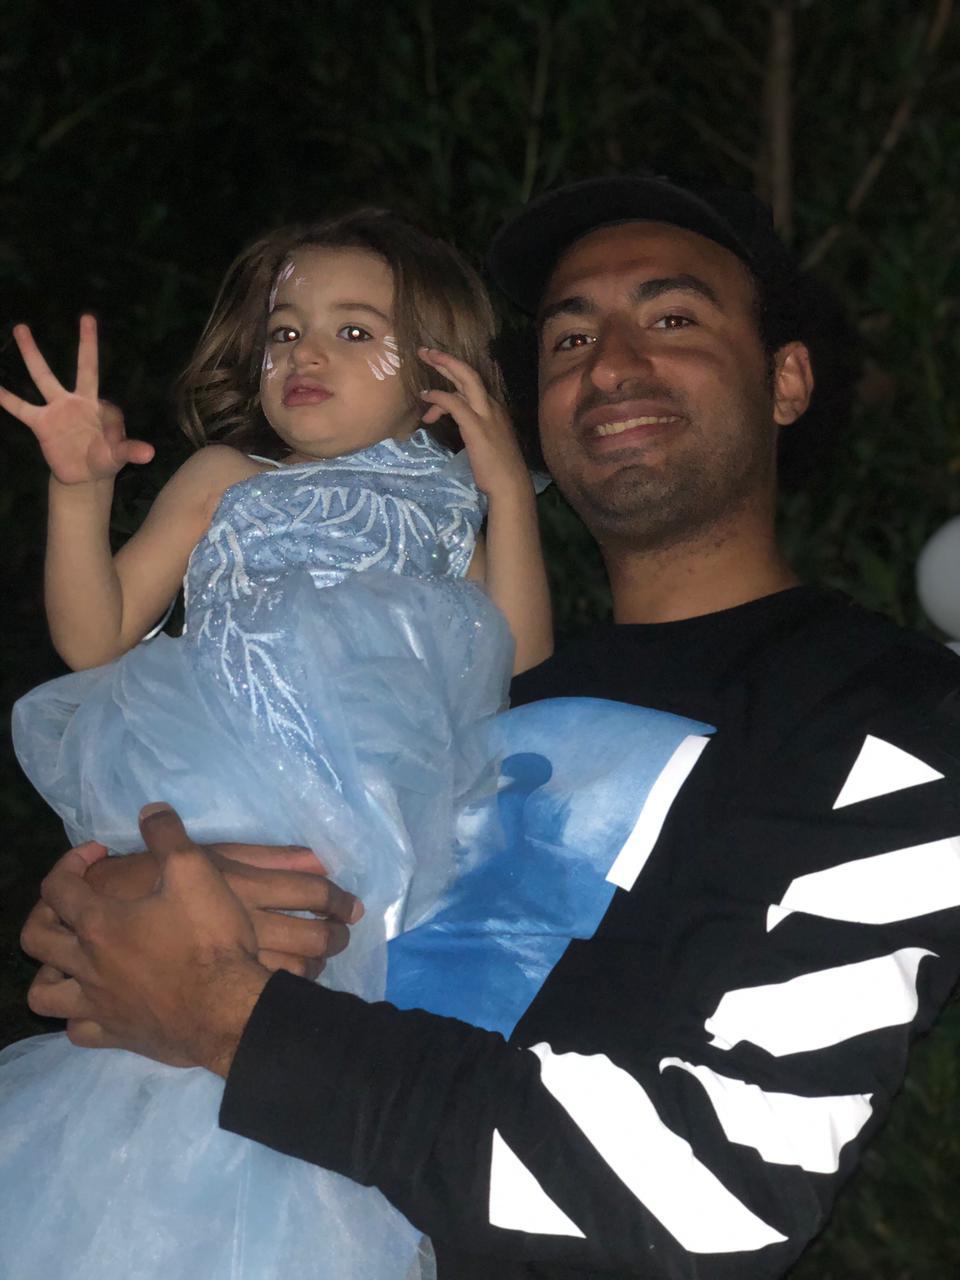 Ali his lord and his daughter Malika